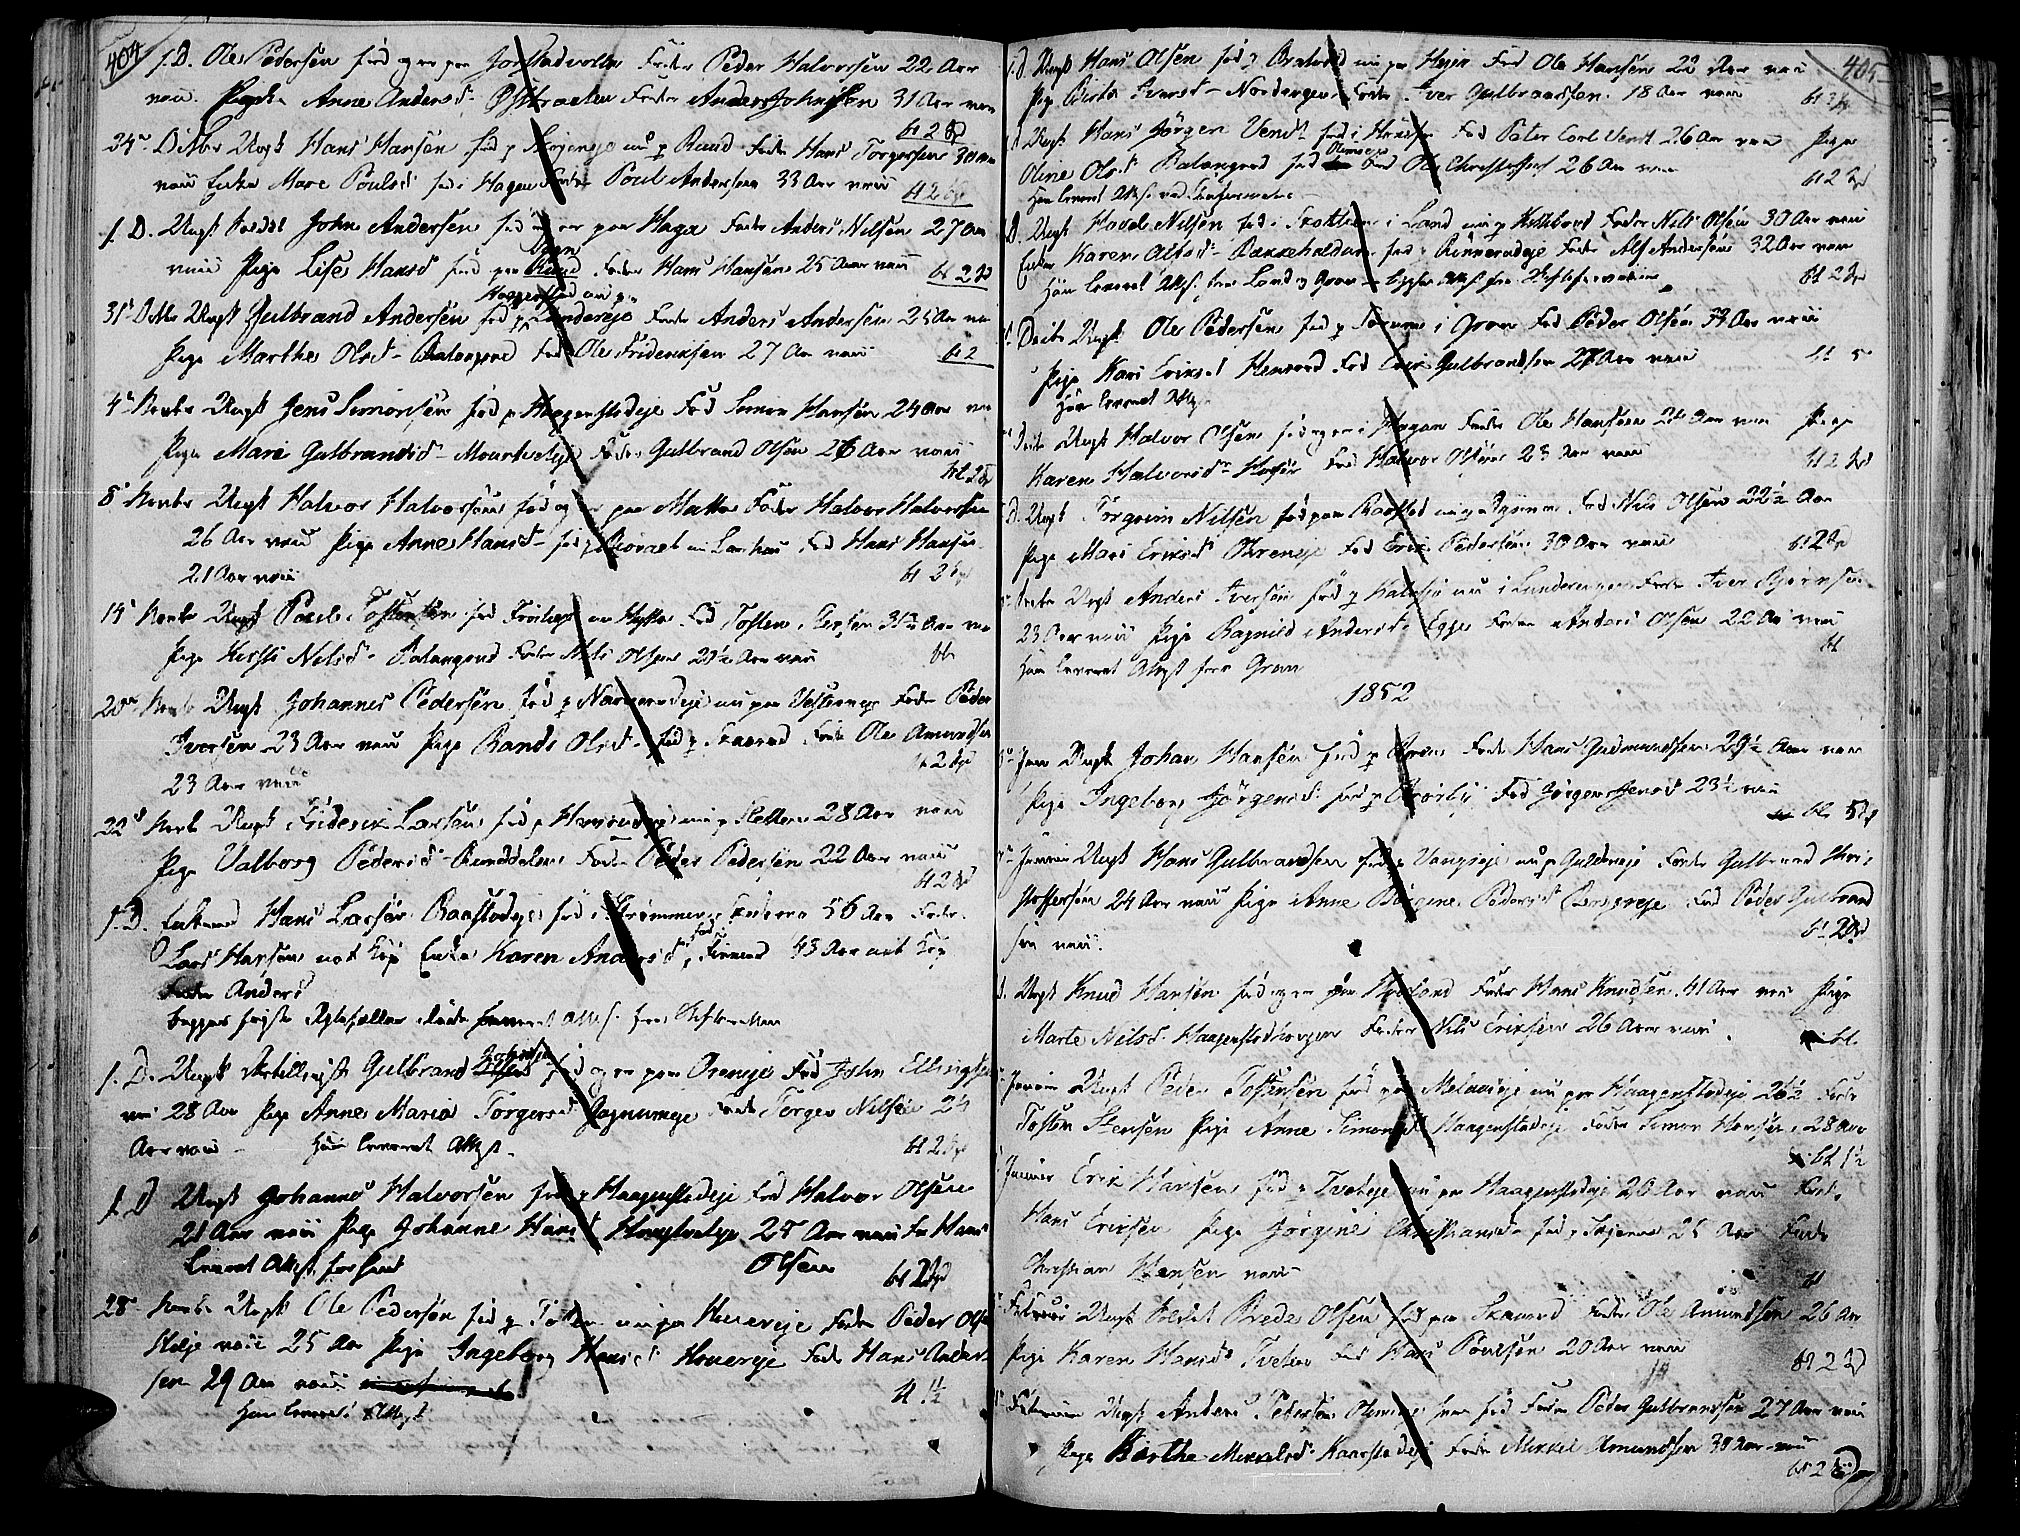 SAH, Jevnaker prestekontor, Ministerialbok nr. 4, 1800-1861, s. 404-405